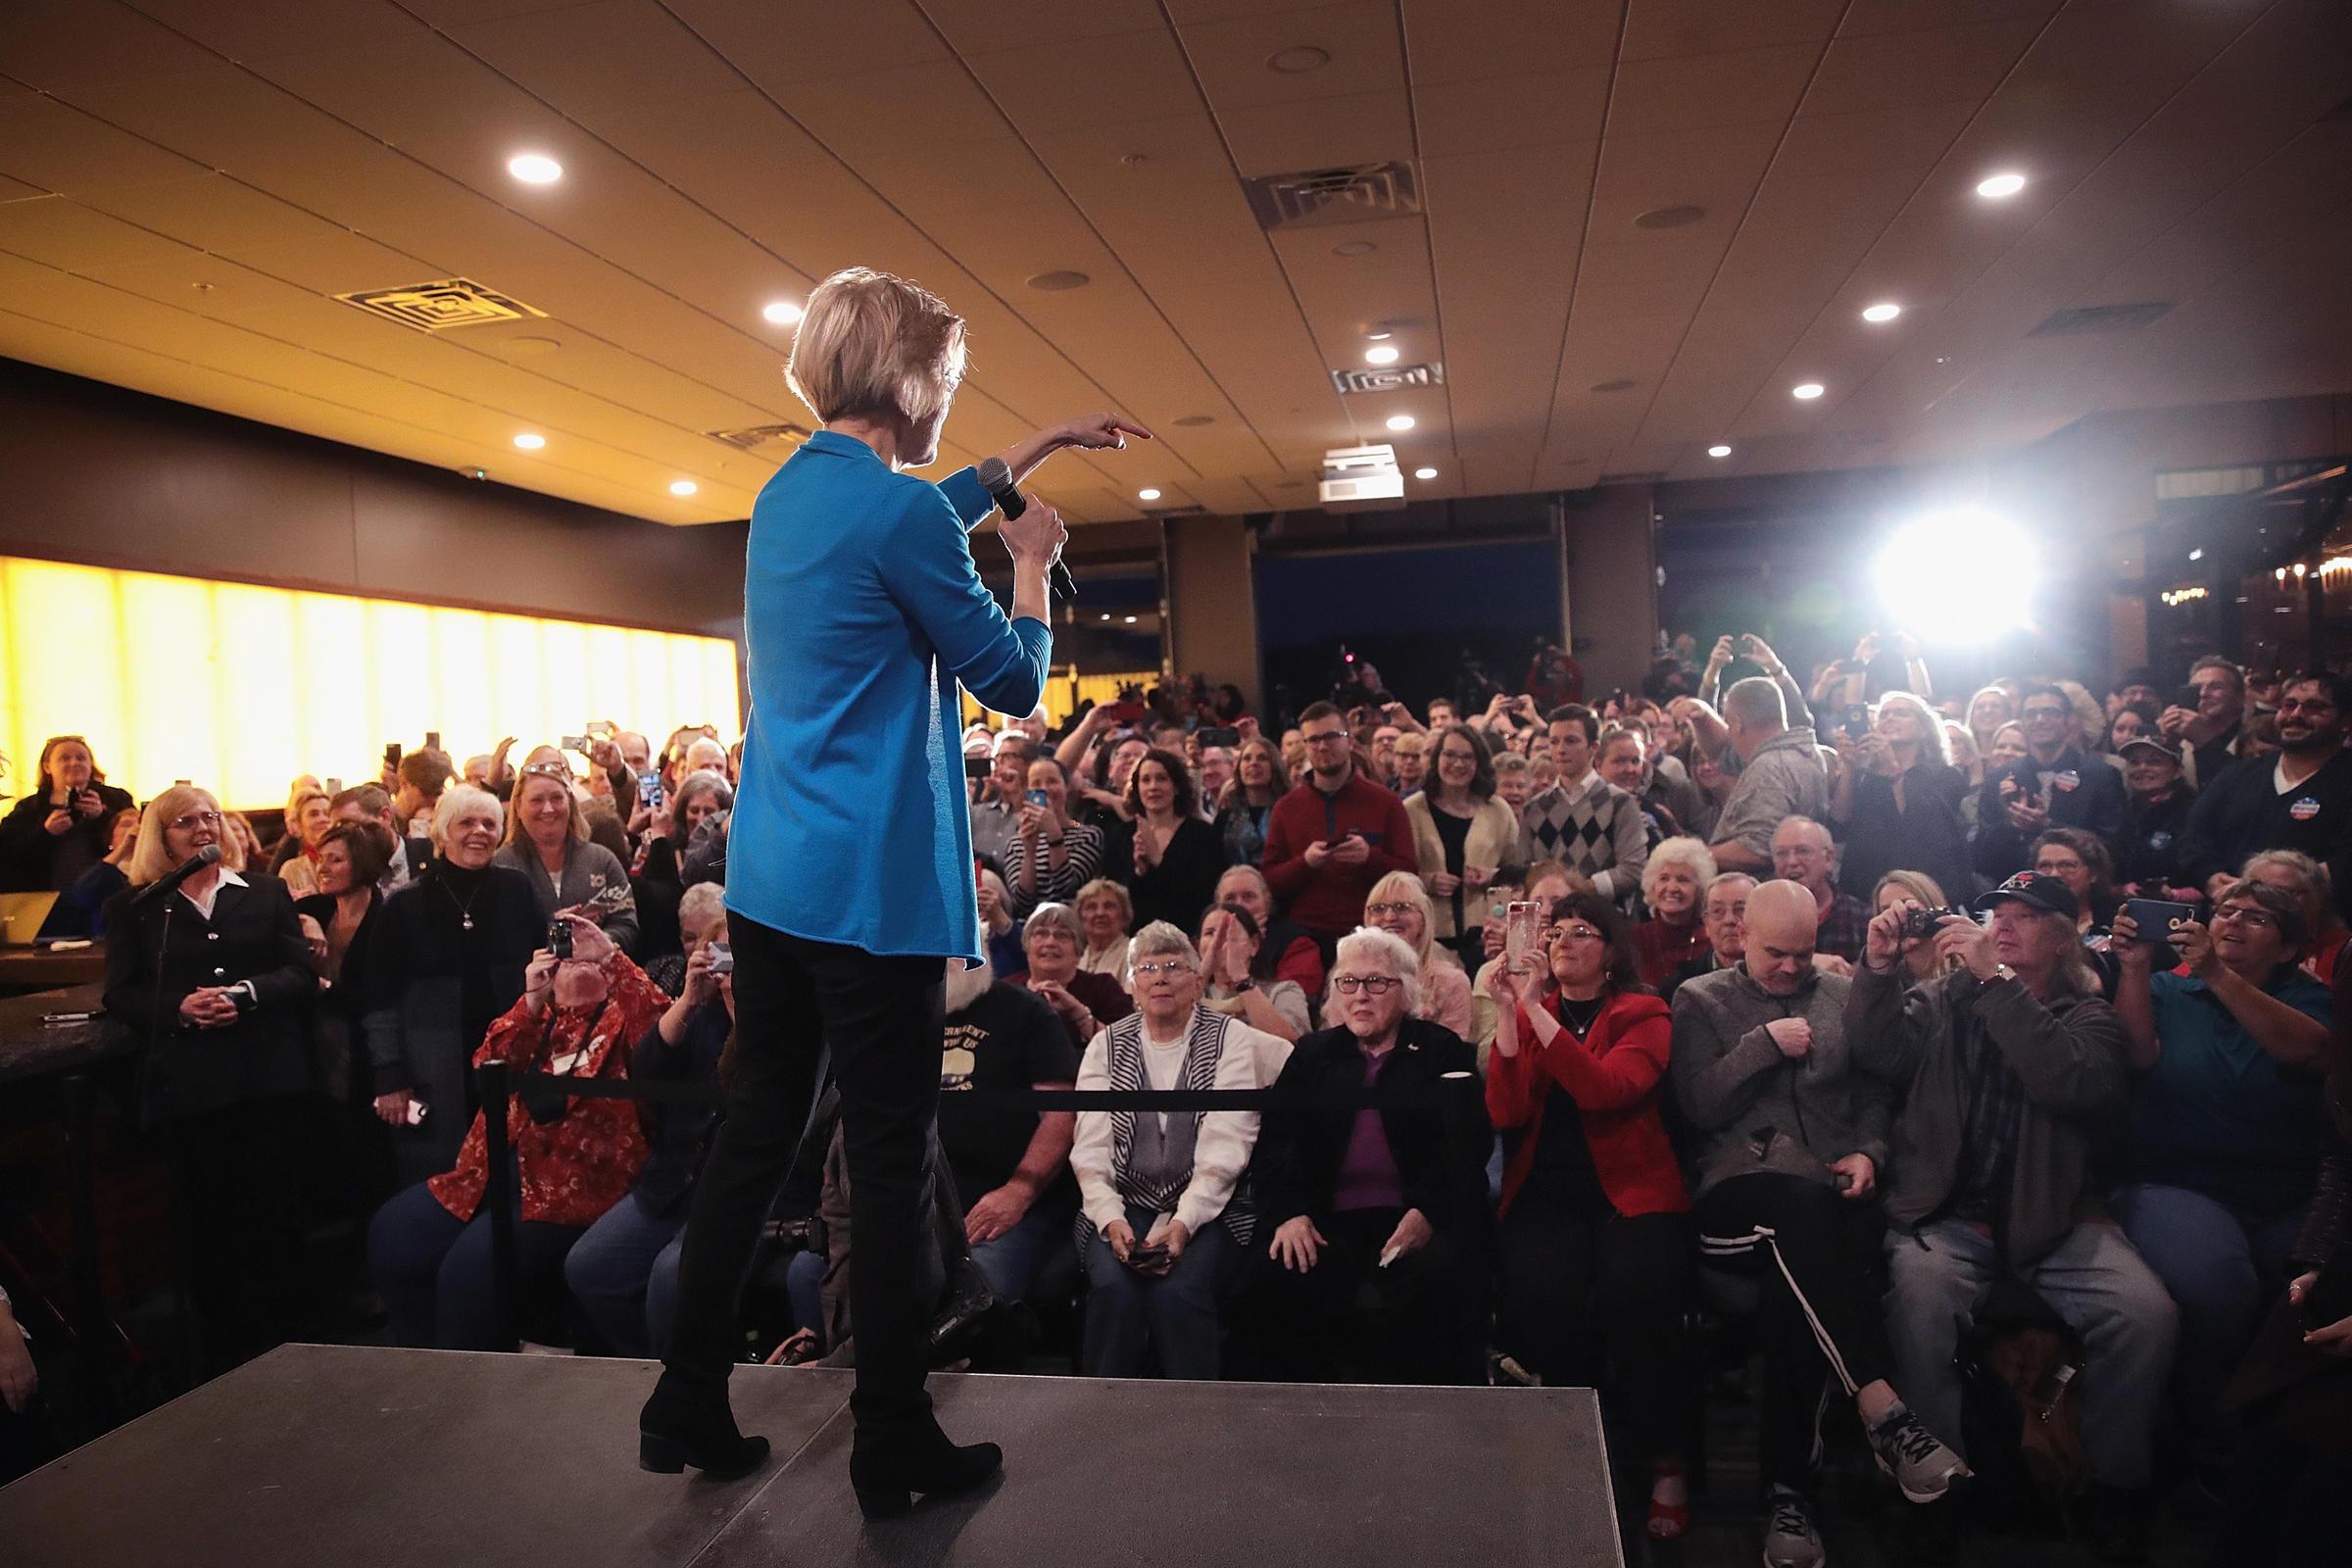 Warren Kicks Off 2020 Presidential Campaign In Iowa